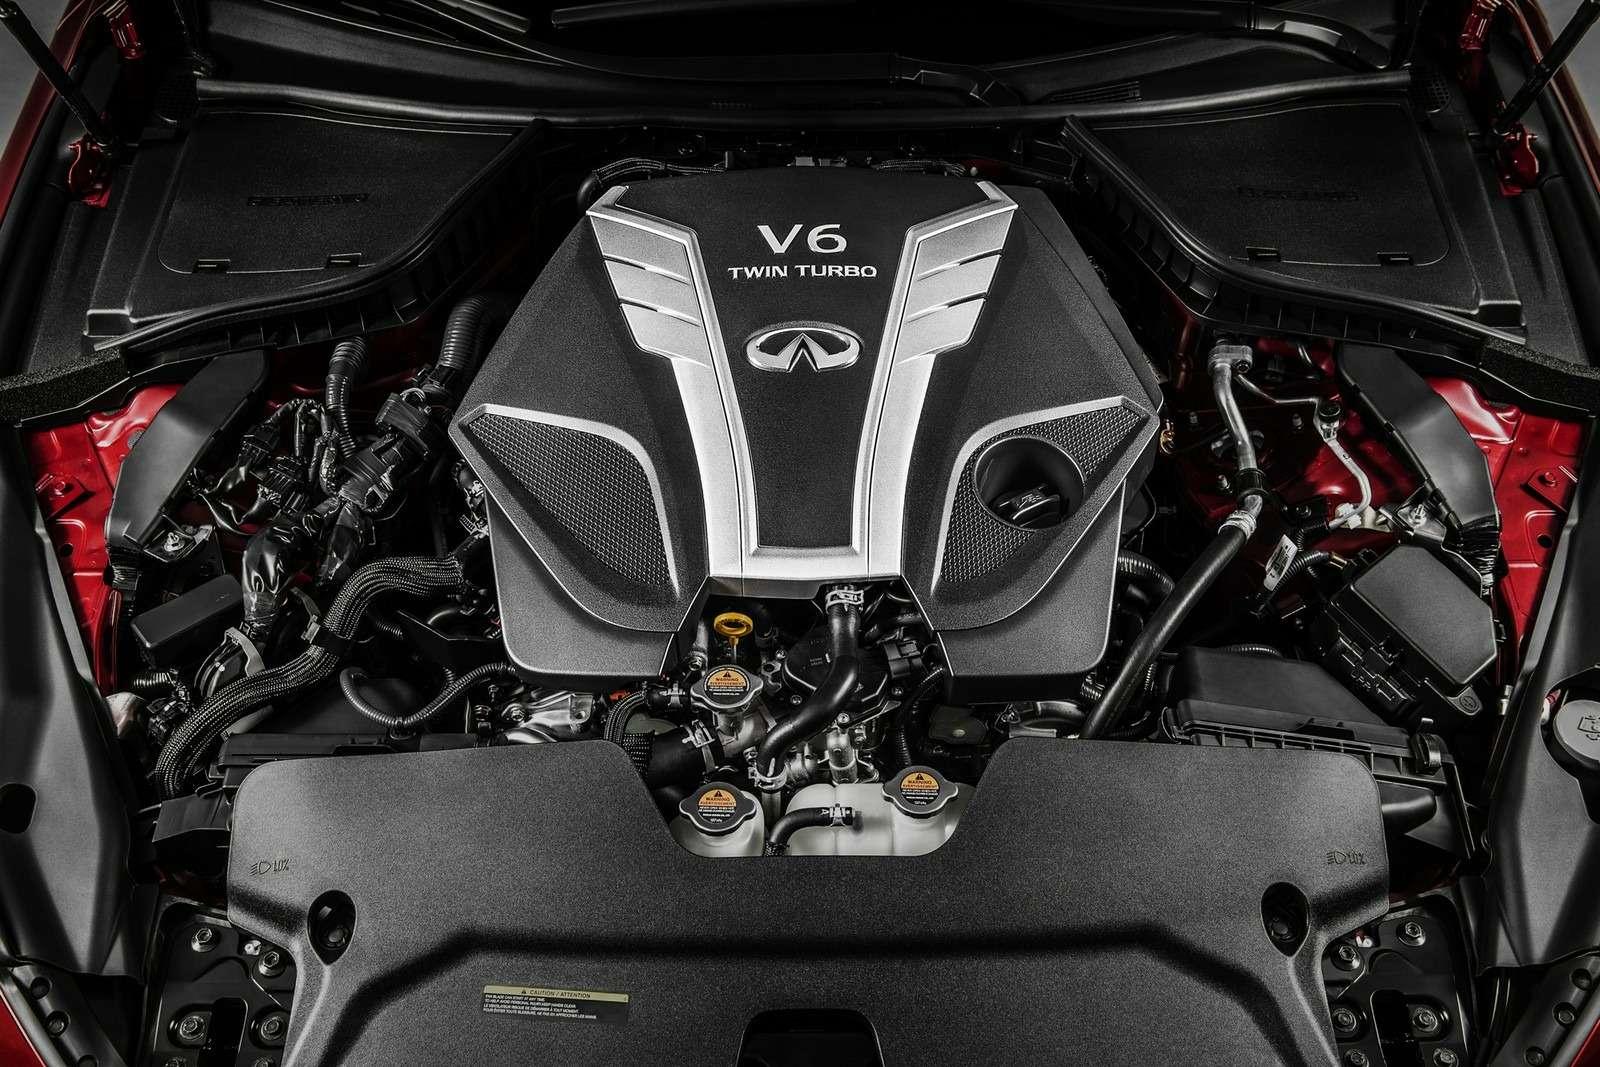 Infiniti's new 3.0-liter V6twin-turbo engine